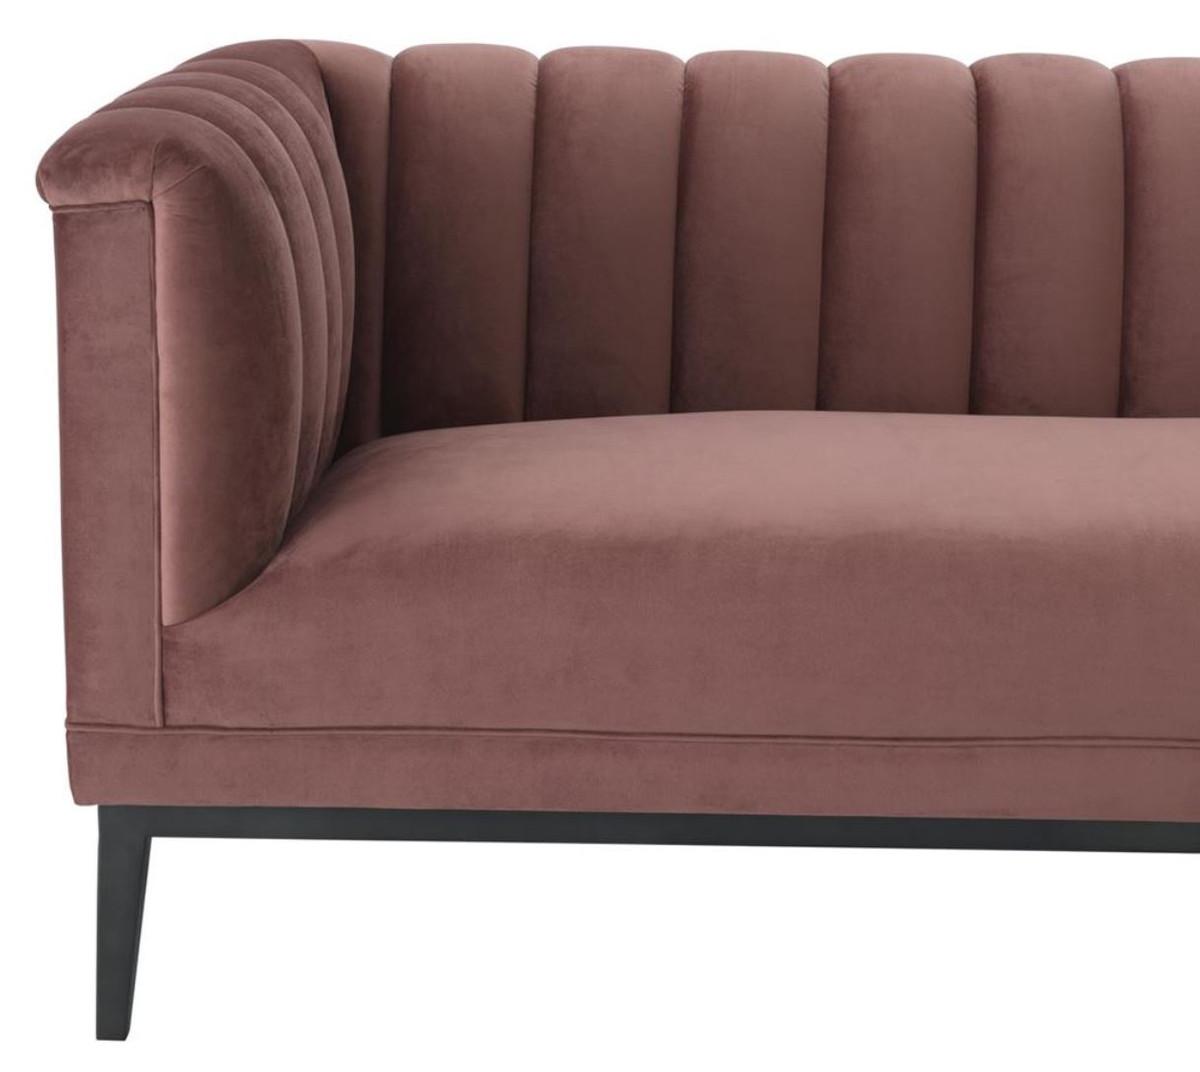 casa padrino luxus sofa altrosa 230 x 86 x h 75 cm wohnzimmerm bel sofas luxus hotel sofas. Black Bedroom Furniture Sets. Home Design Ideas